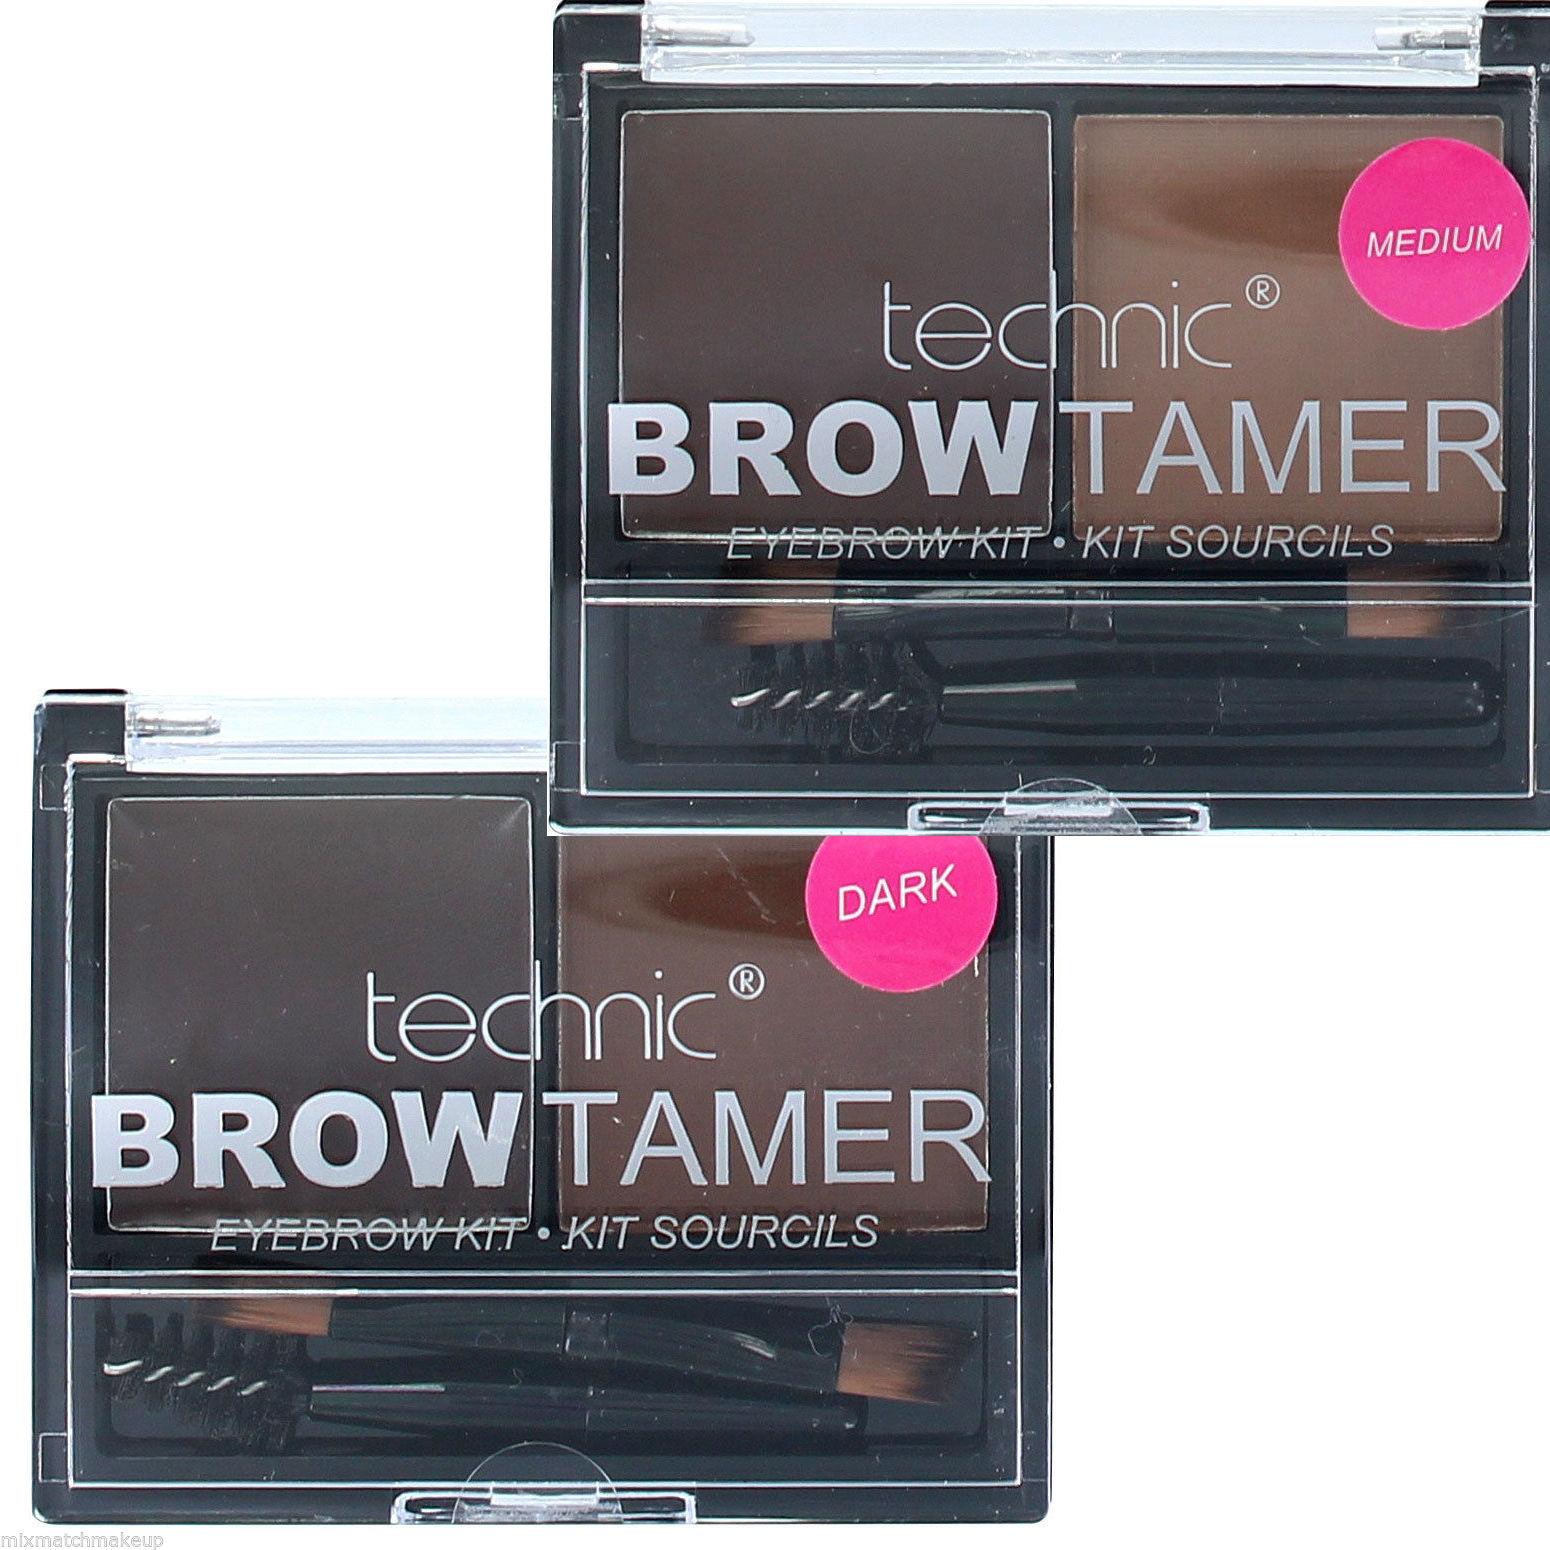 Technic Brow Tamer Compact Eyebrow Kit Powder Wax Brow ...